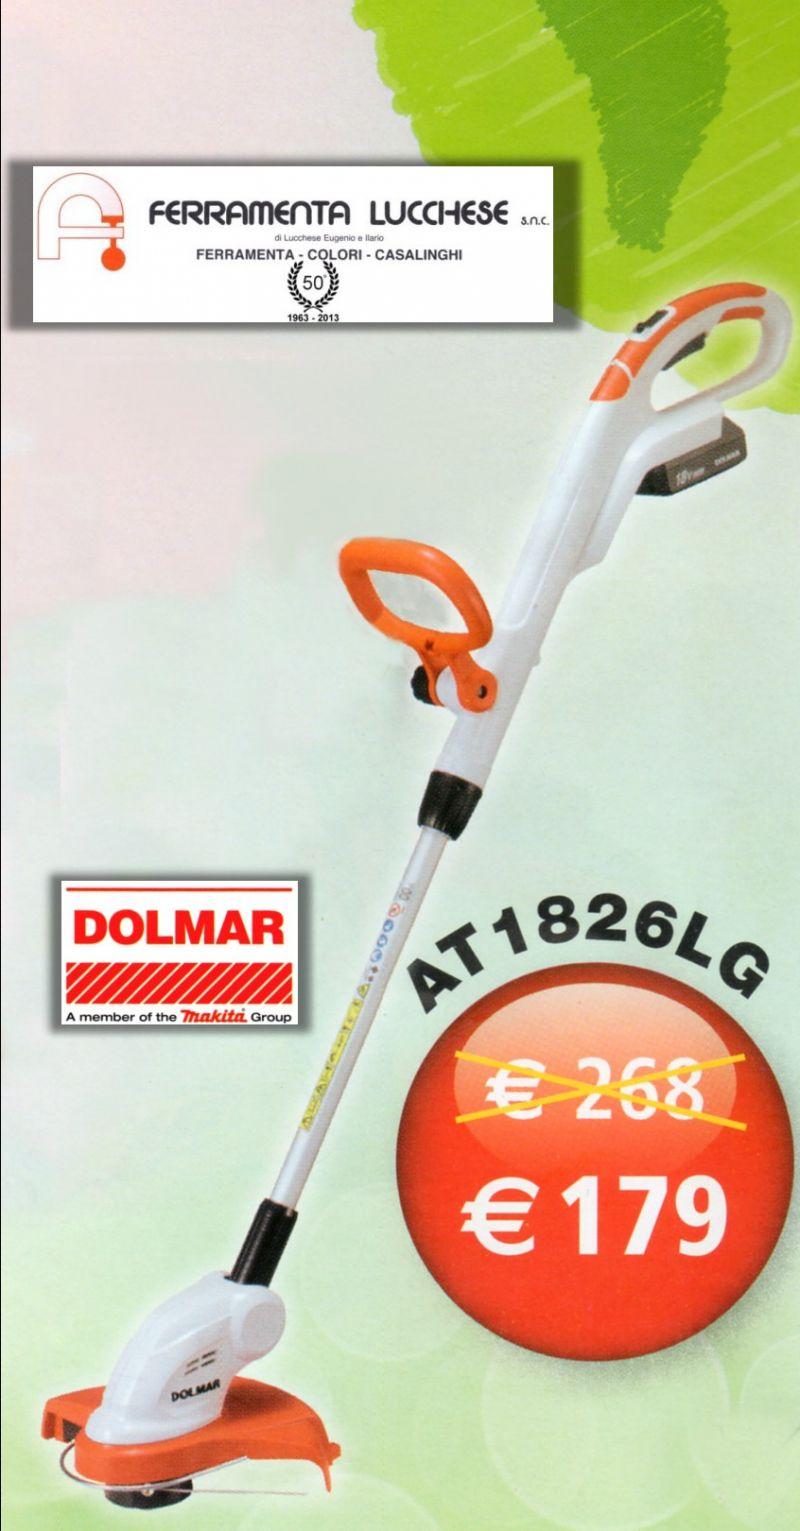 tagliabordi trimmer a batteria at1826lg